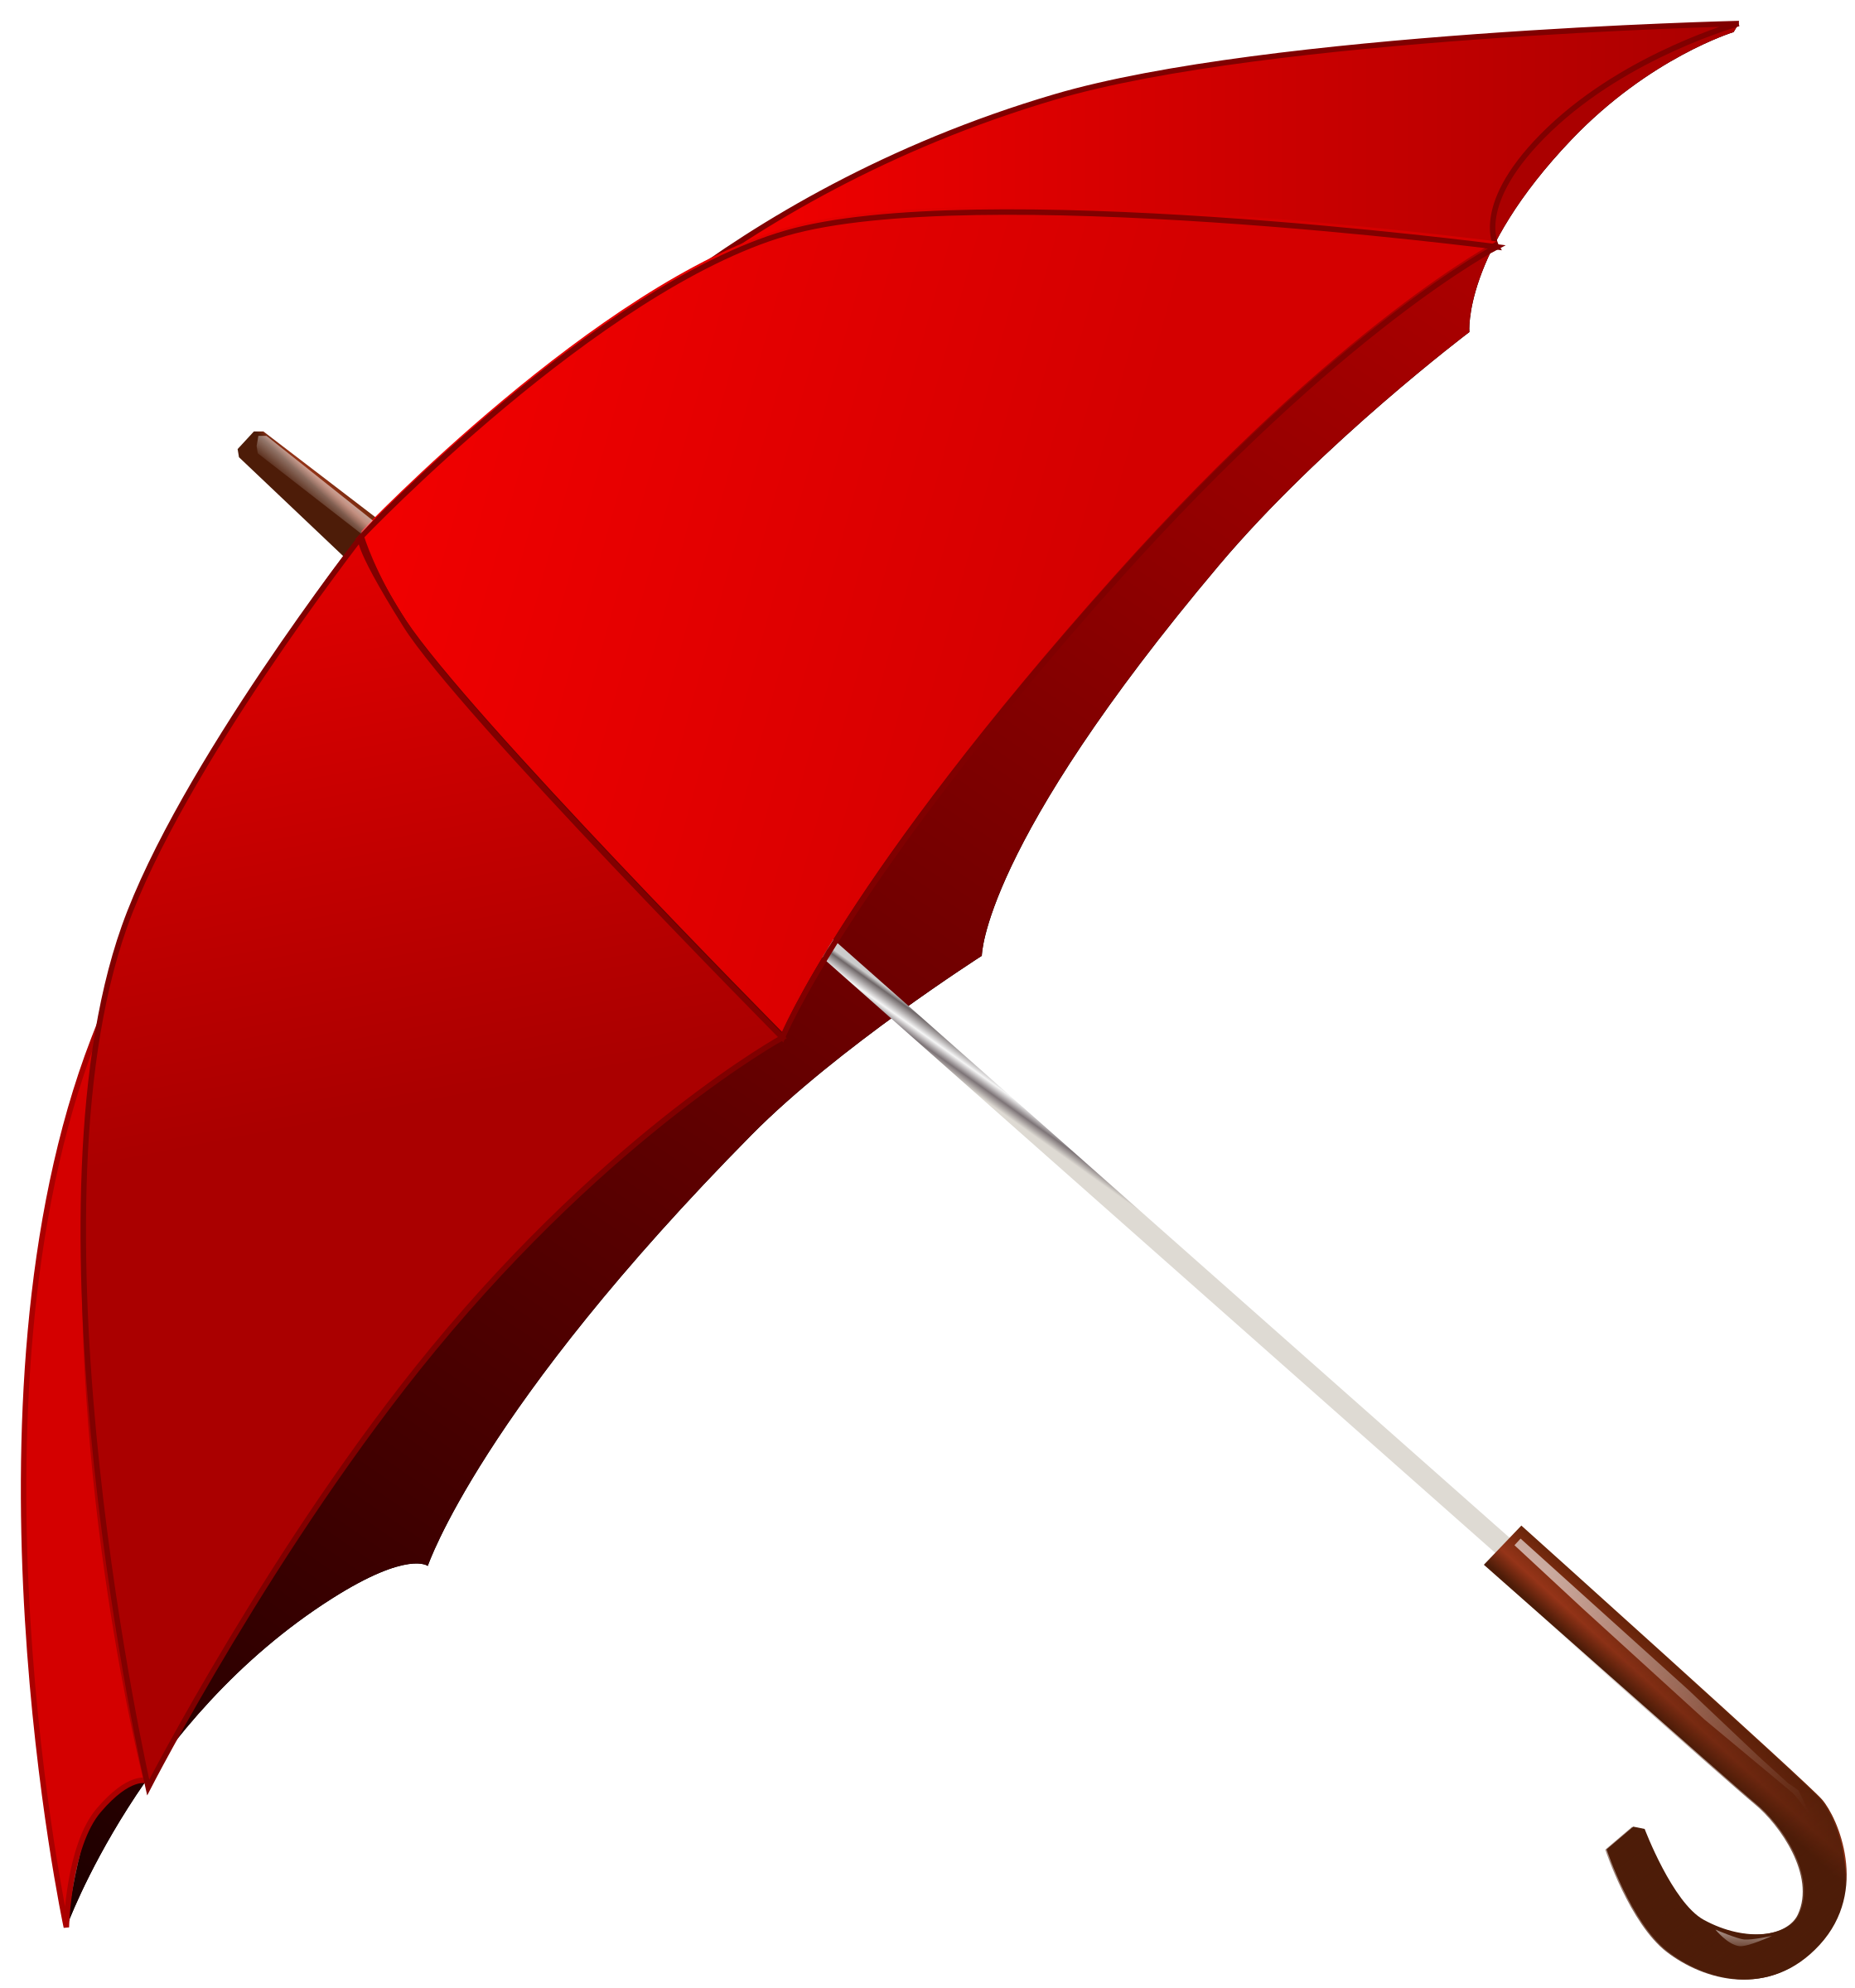 Clipart - Red Umbrella